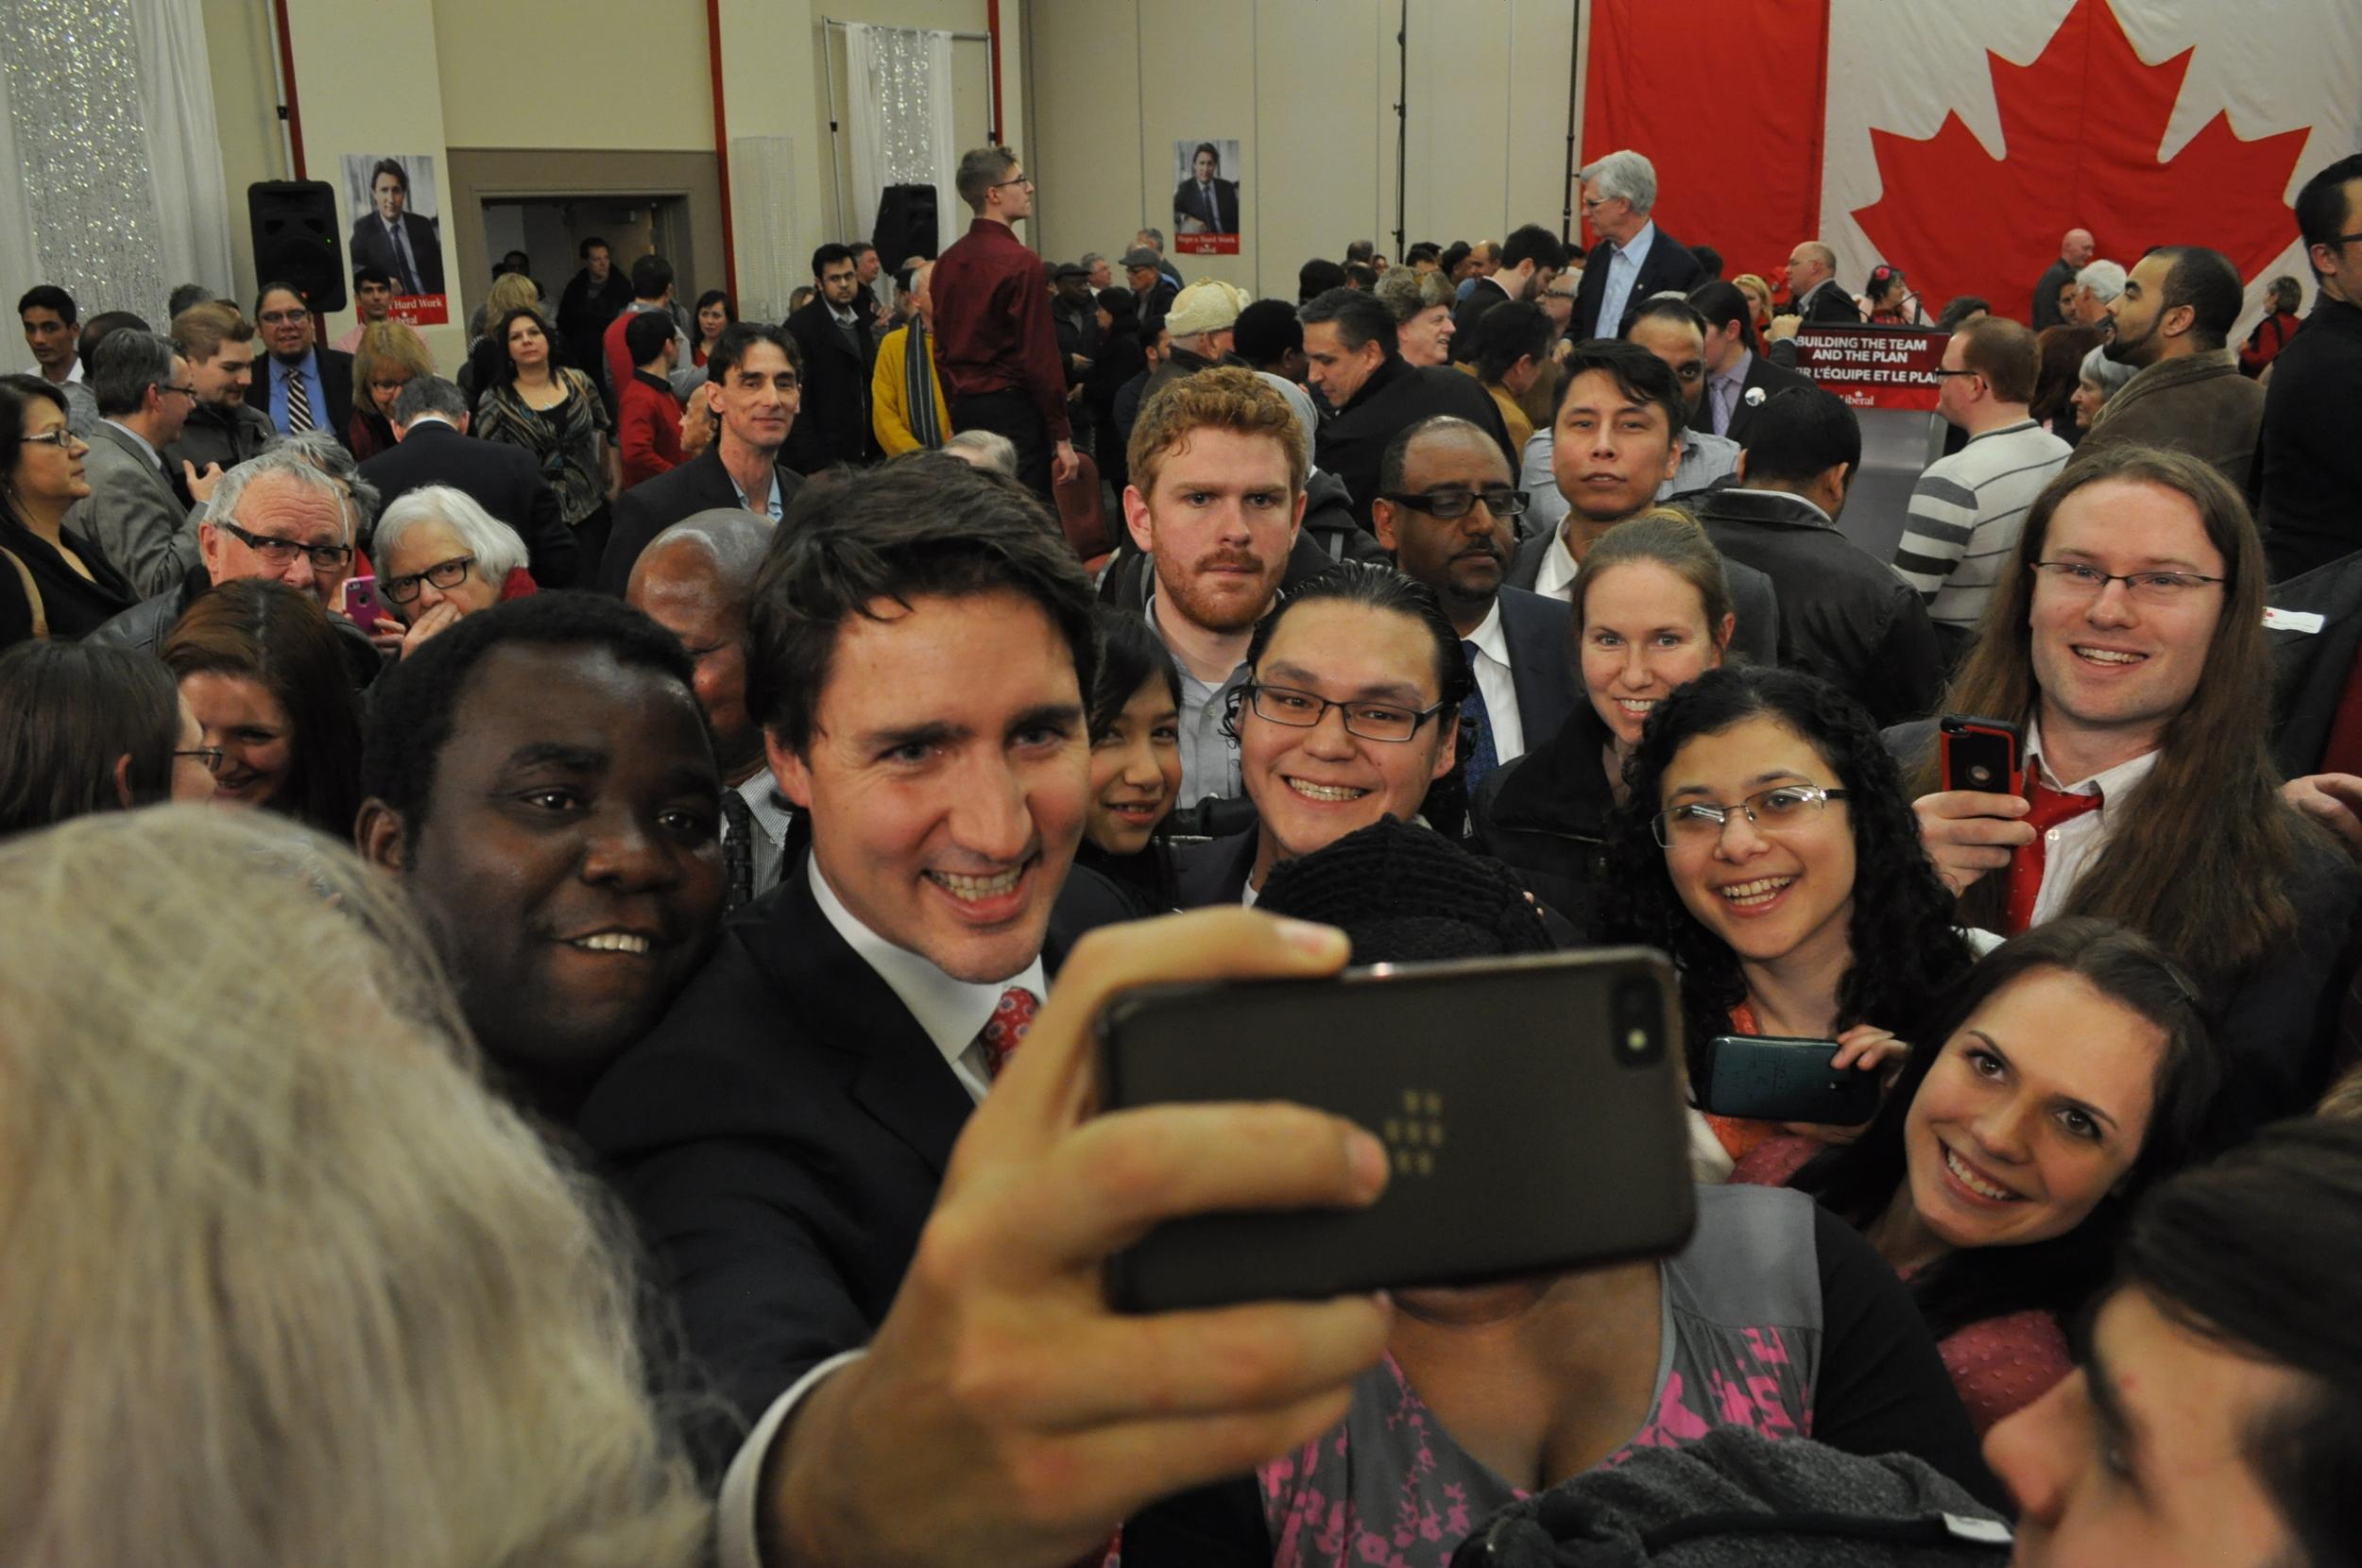 Justin Trudeau in Winnipeg via CommunityNewsCommons.